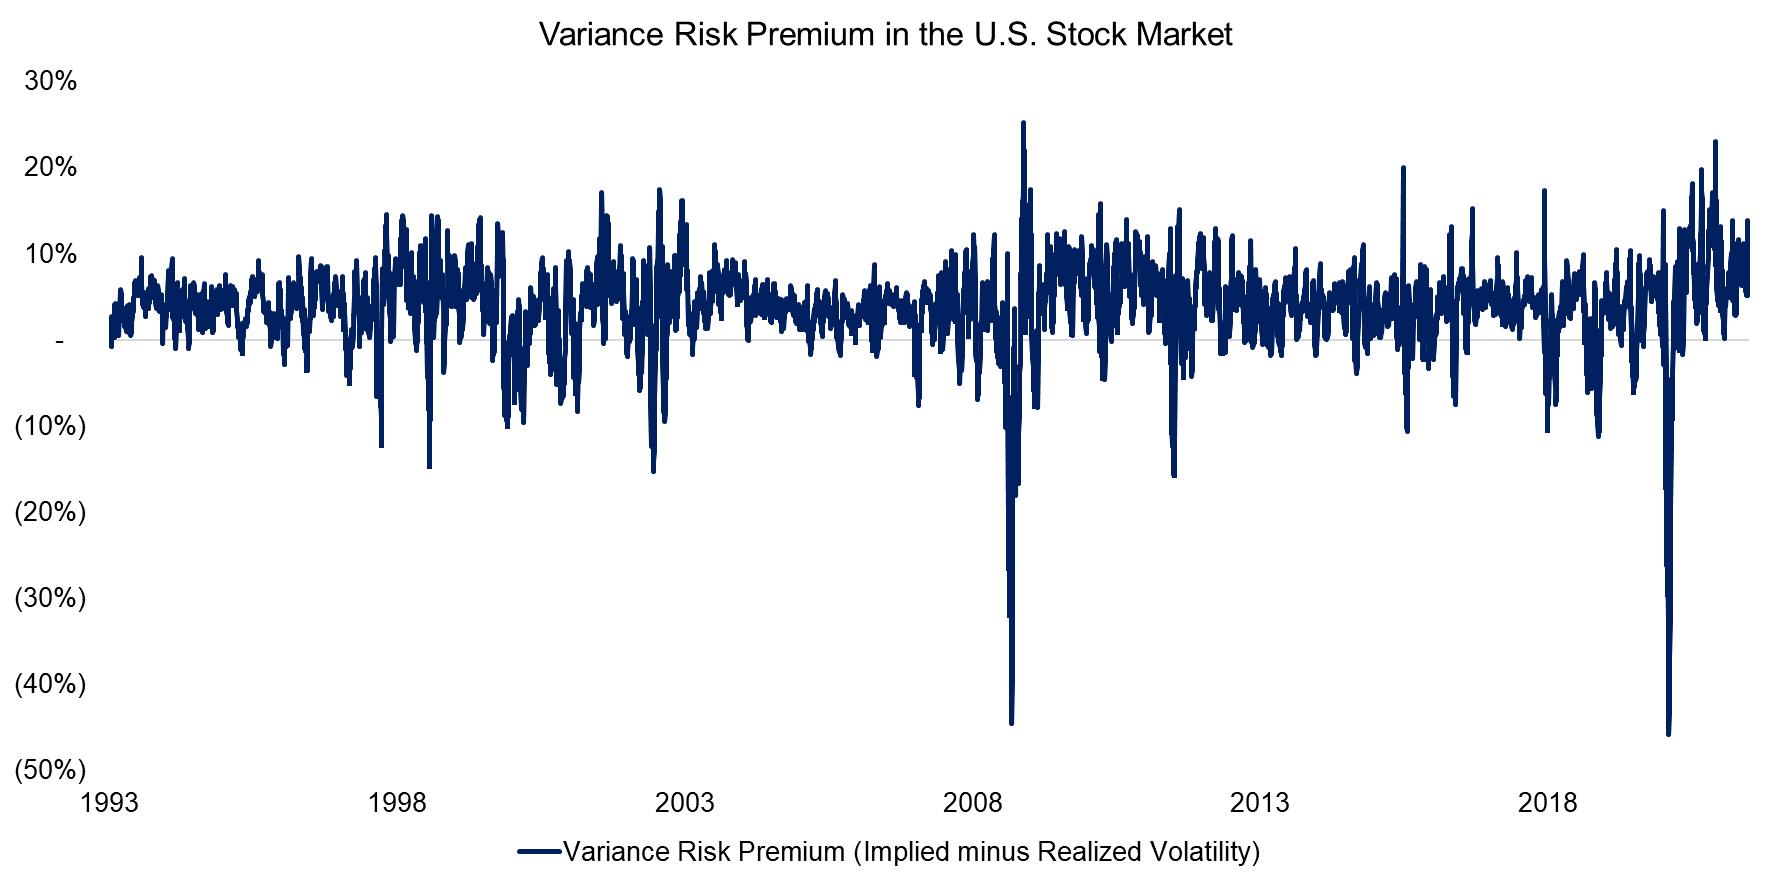 Variance Risk Premium in the U.S. Stock Market